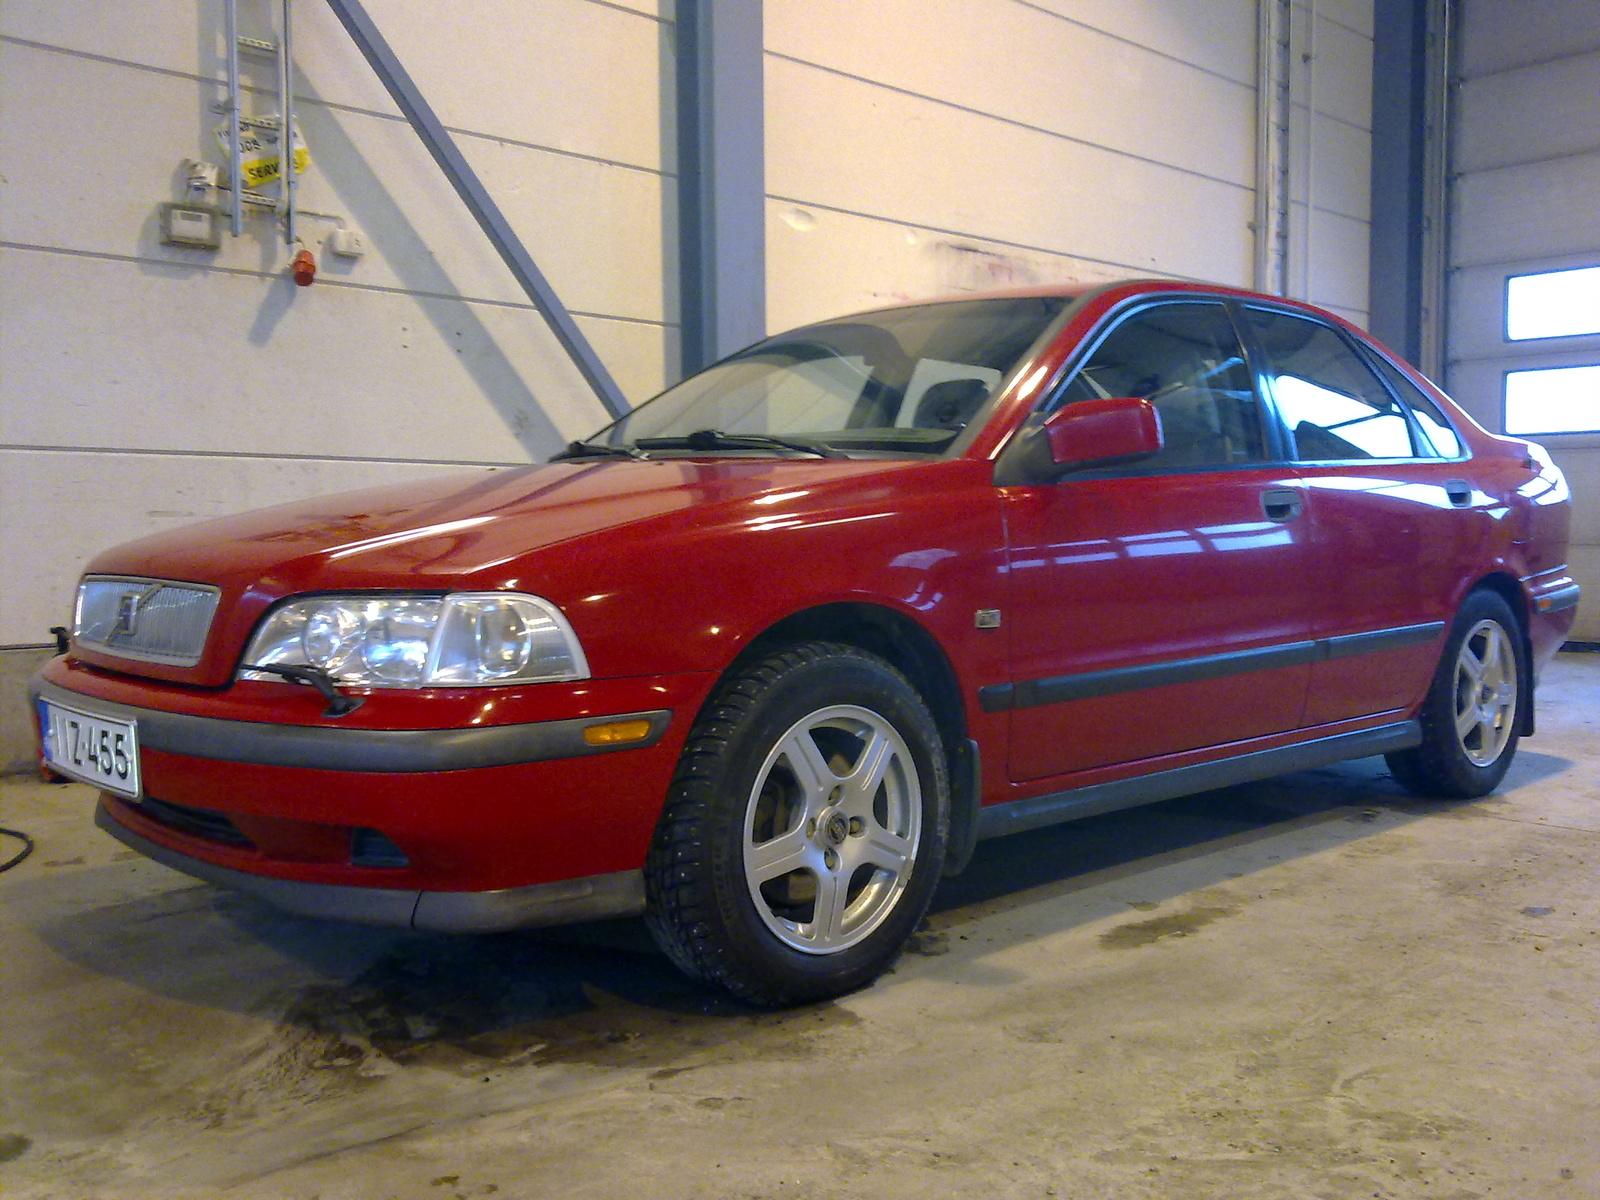 Volvo on 1999 volvo s40 pictures 1999 volvo s40 picture cargurus